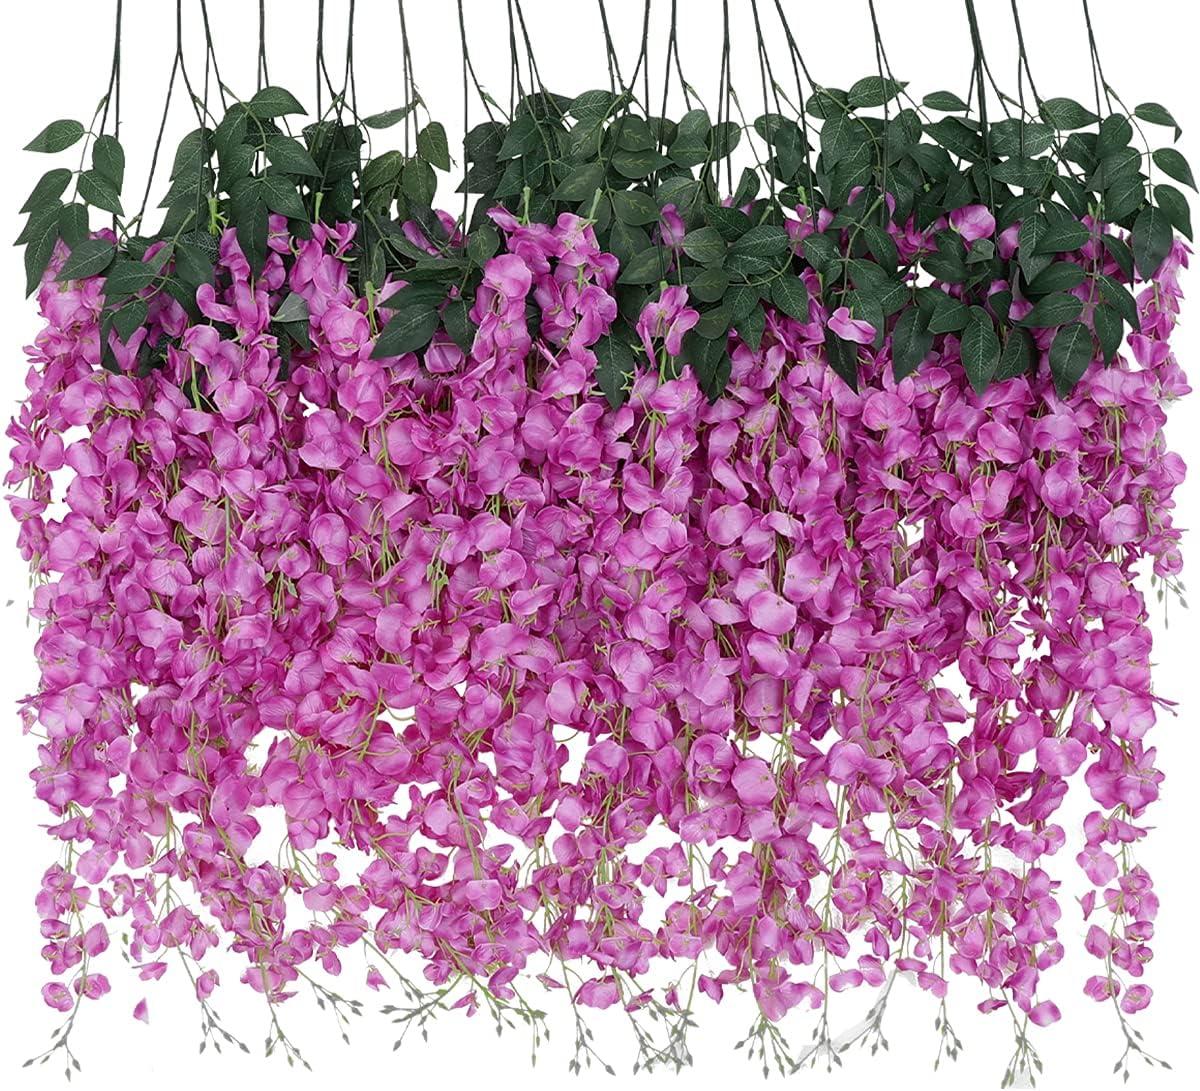 Veryhome 12 Pcs Artificial Cheap sale Silk service Vine Hanging Ratta Wisteria